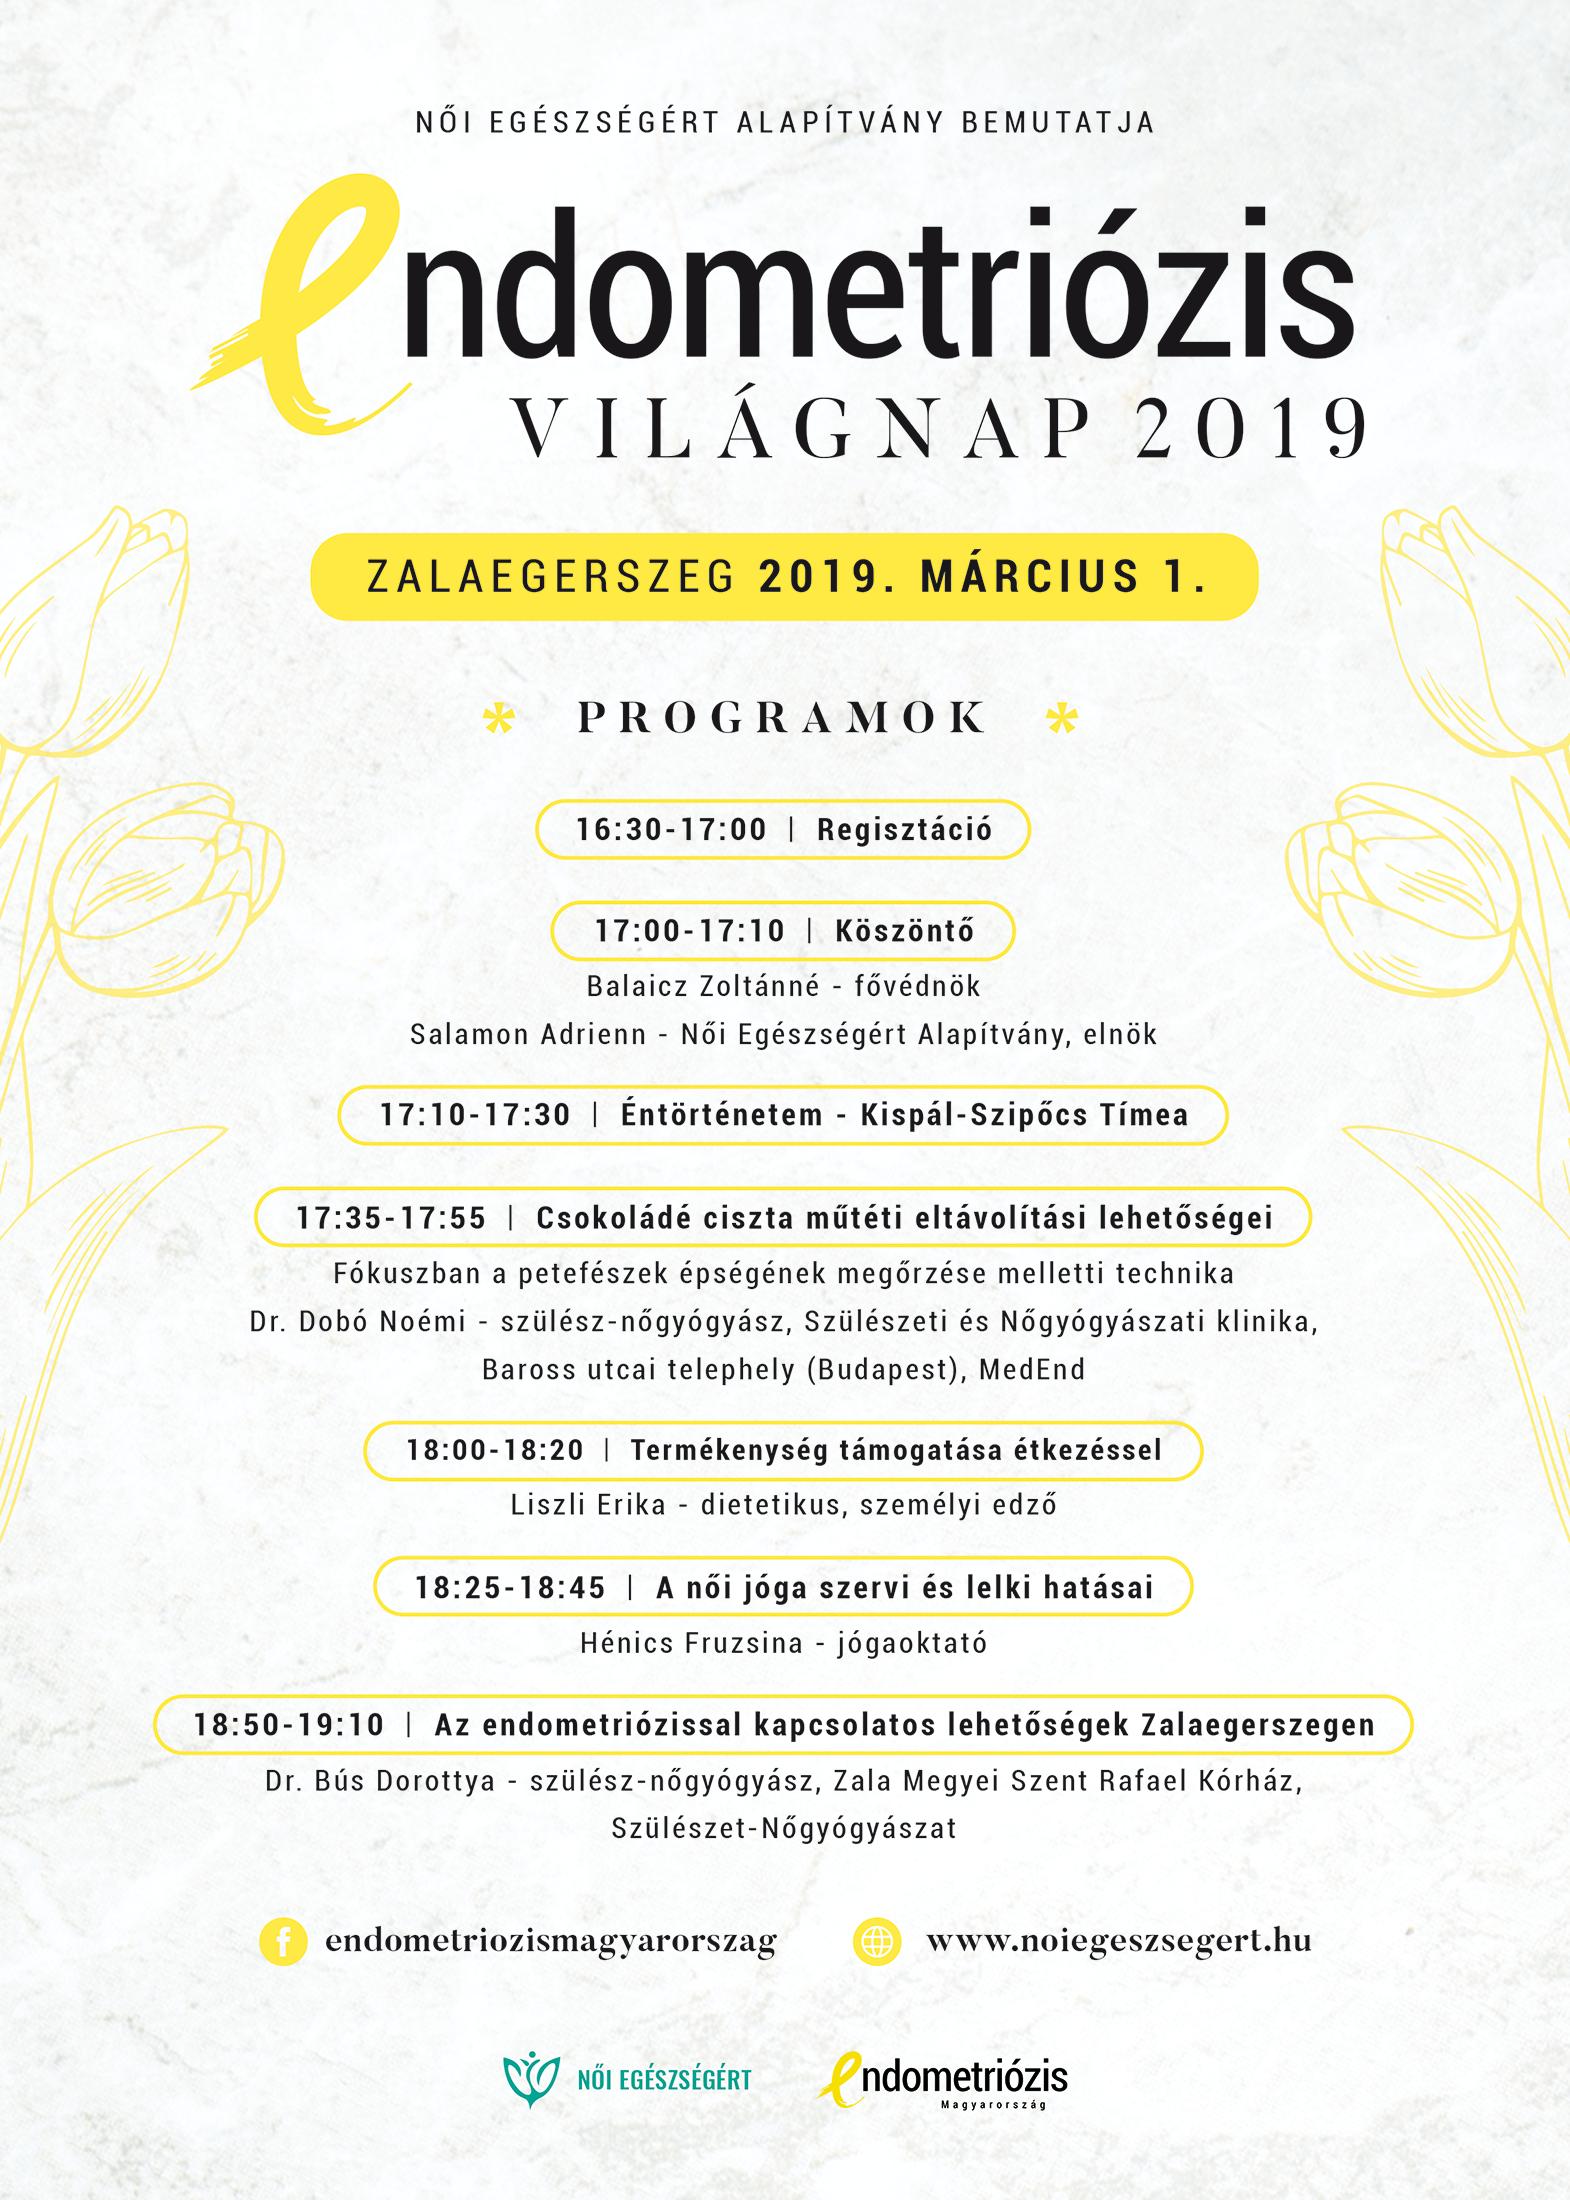 20190301_endo_vilagnap_20190227_zeg_program.png